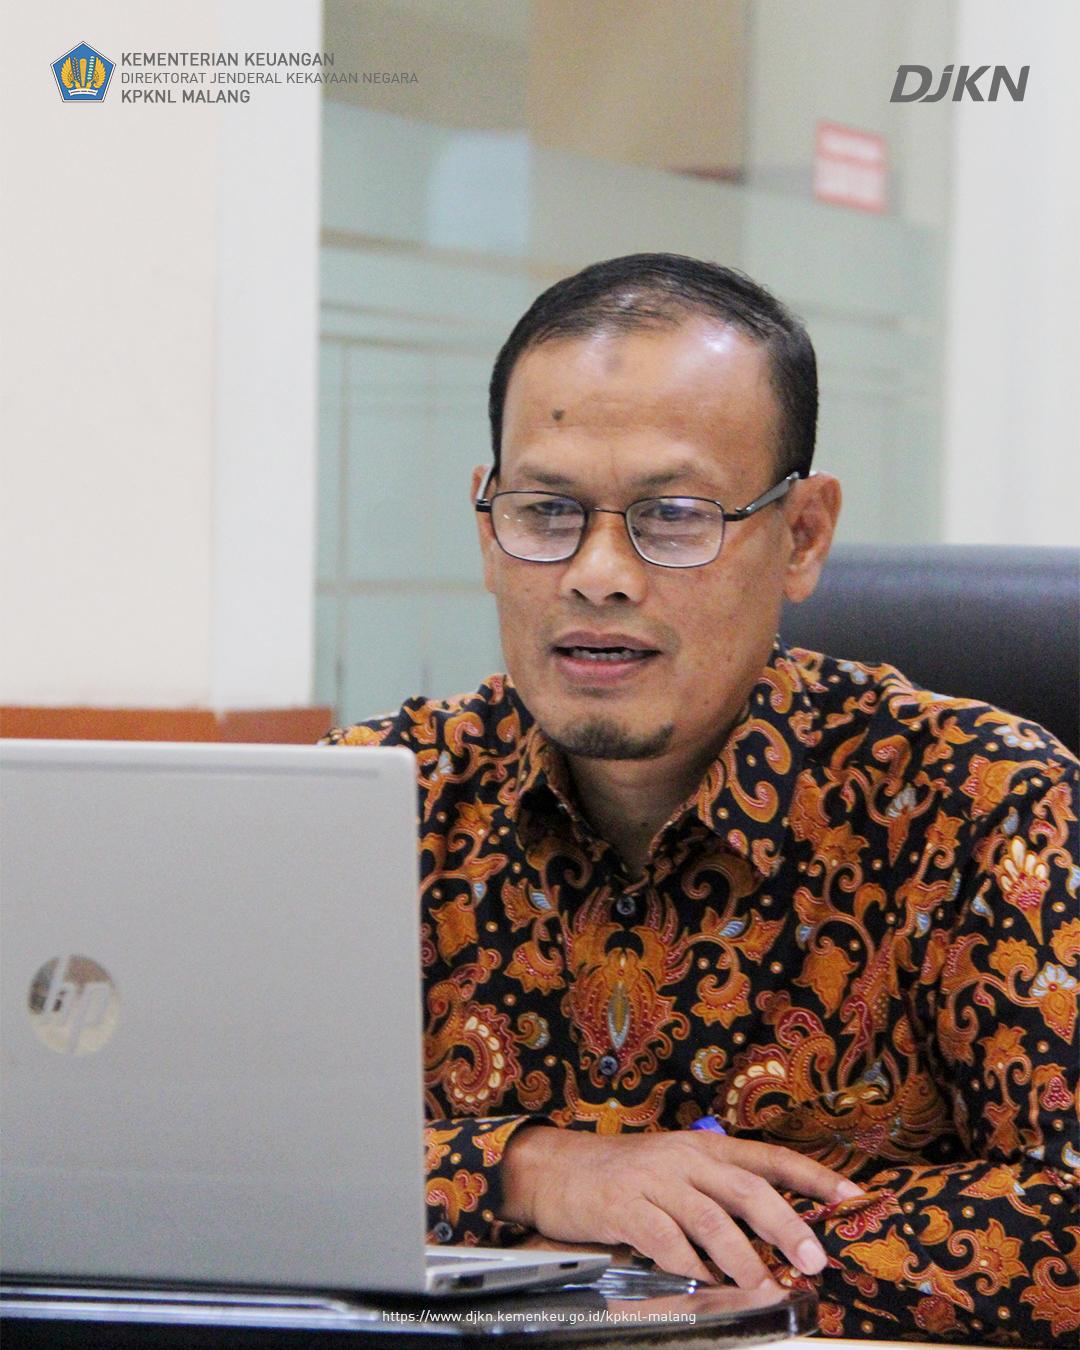 Komitmen Menuju WBK/WBBM, KPKNL Malang Canangkan Zona Integritas